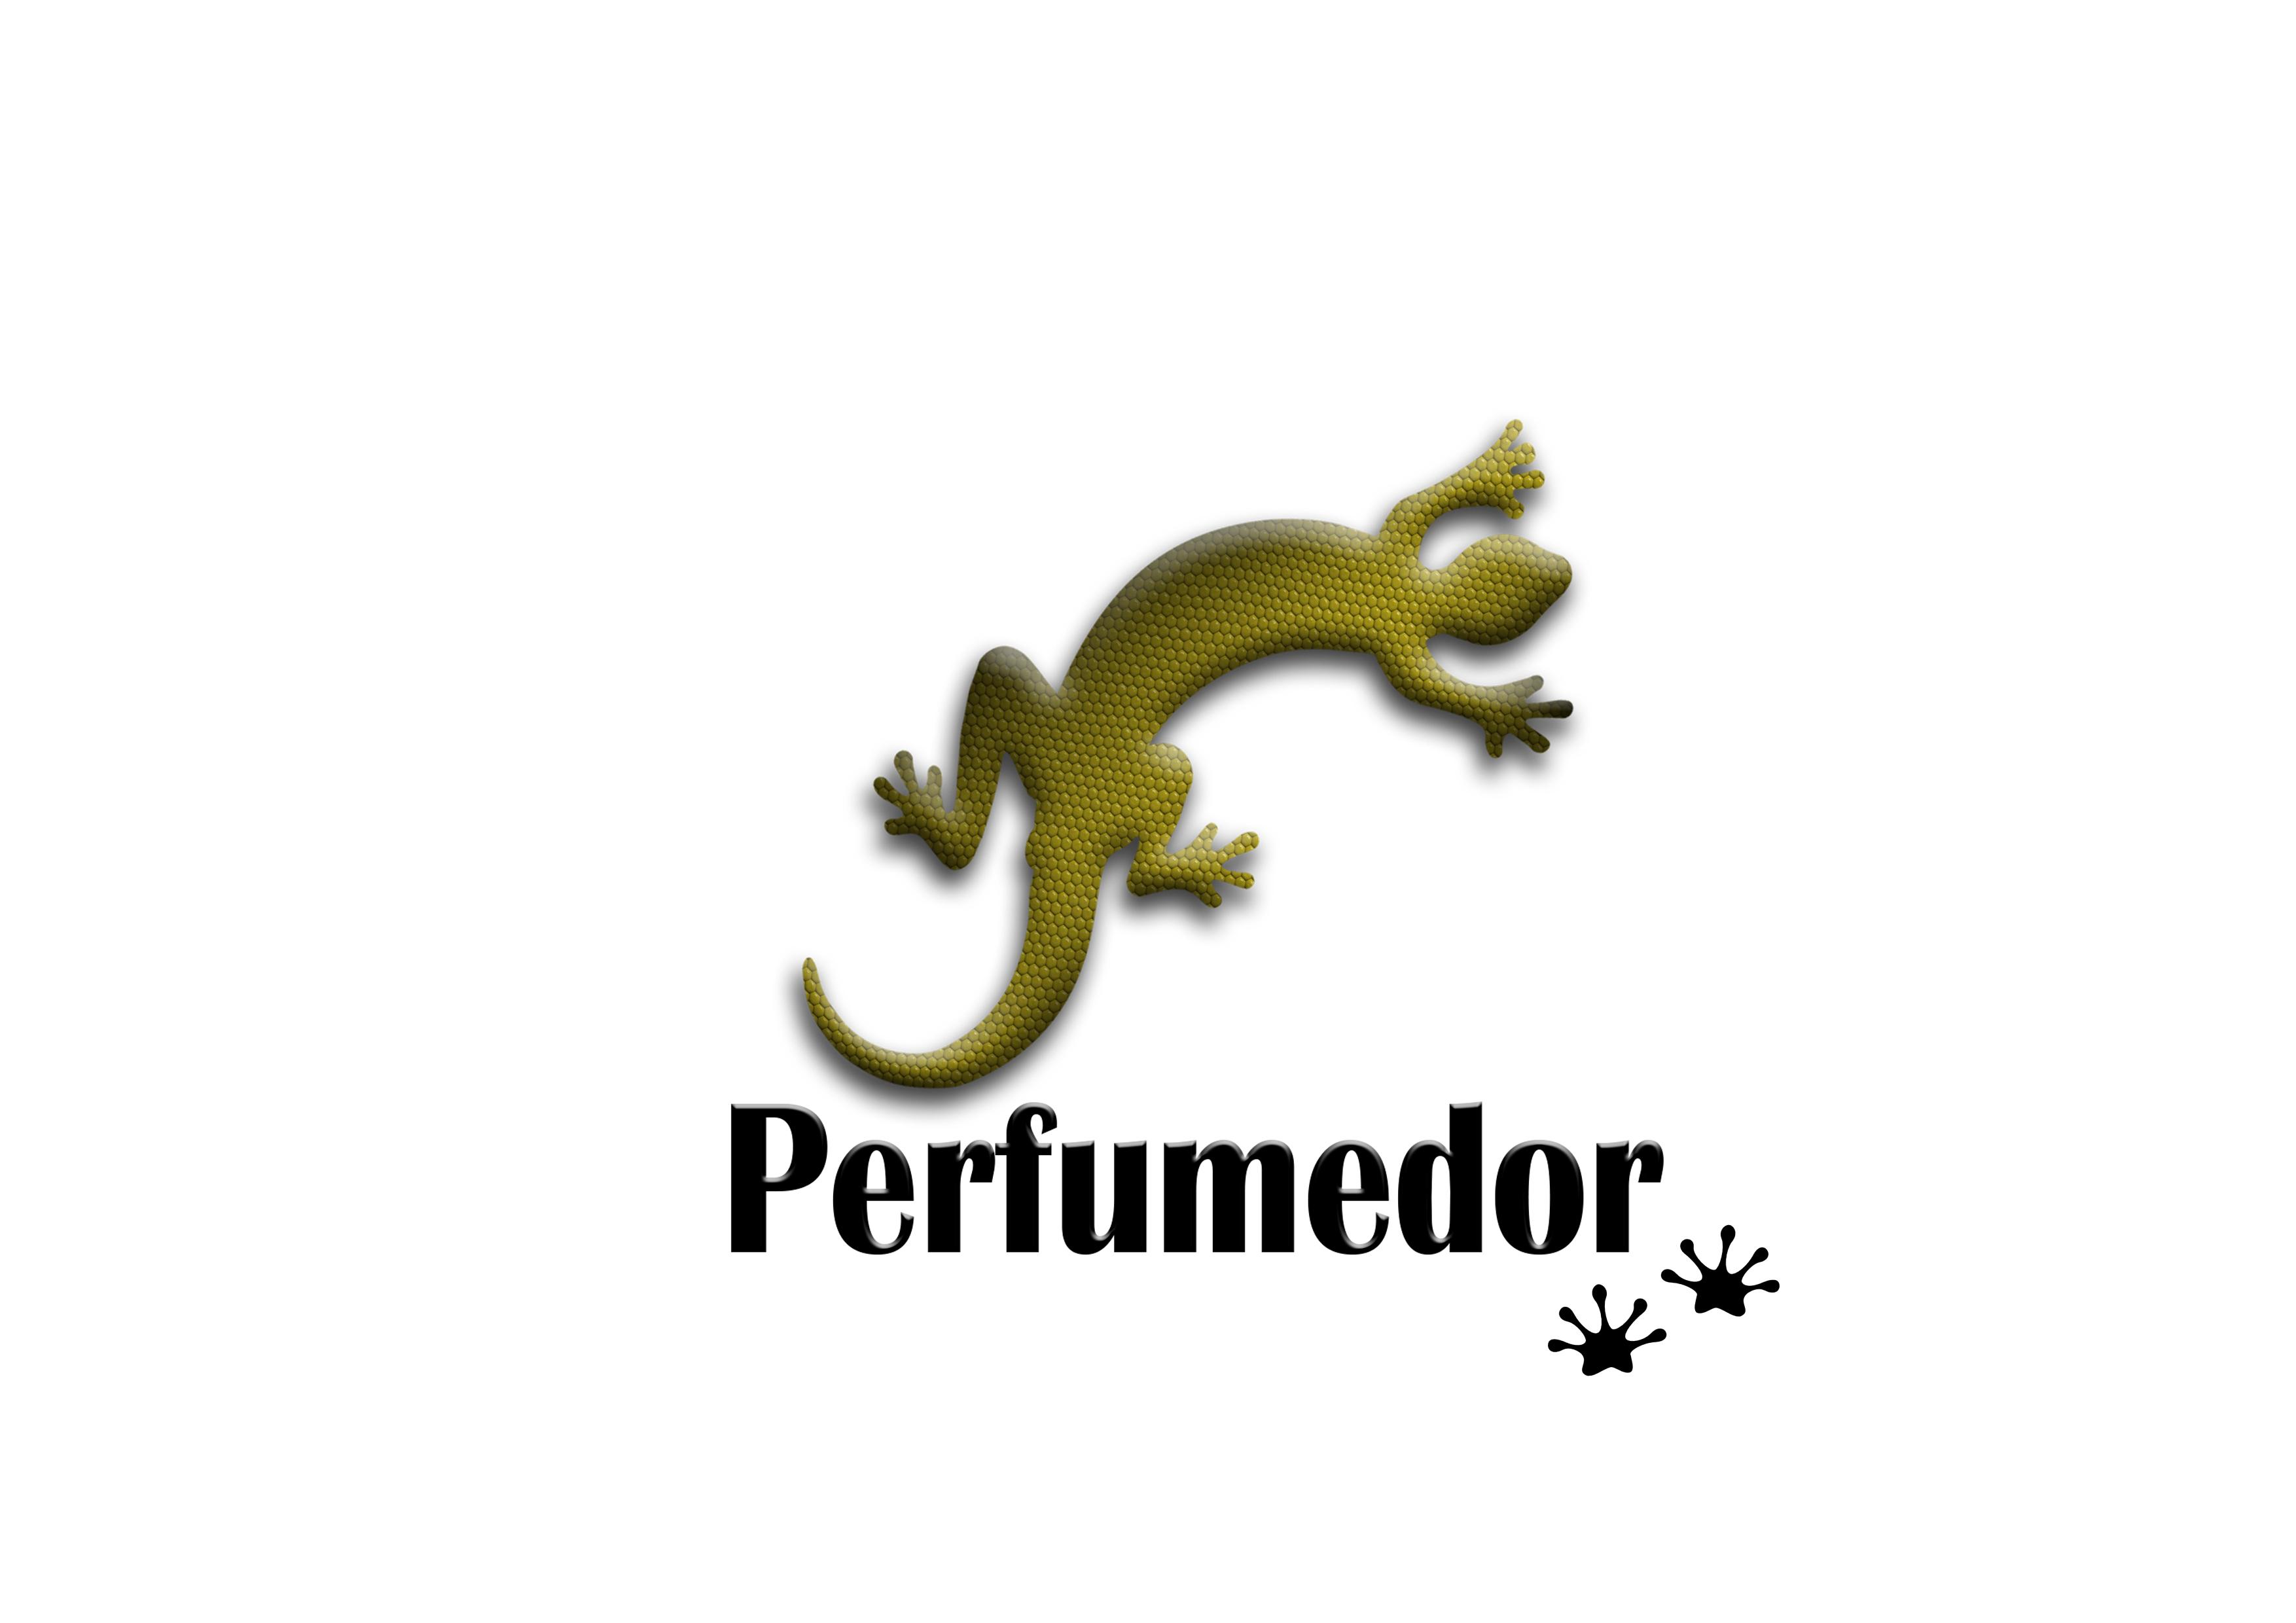 Логотип для интернет-магазина парфюмерии фото f_4895b4a377857c45.jpg